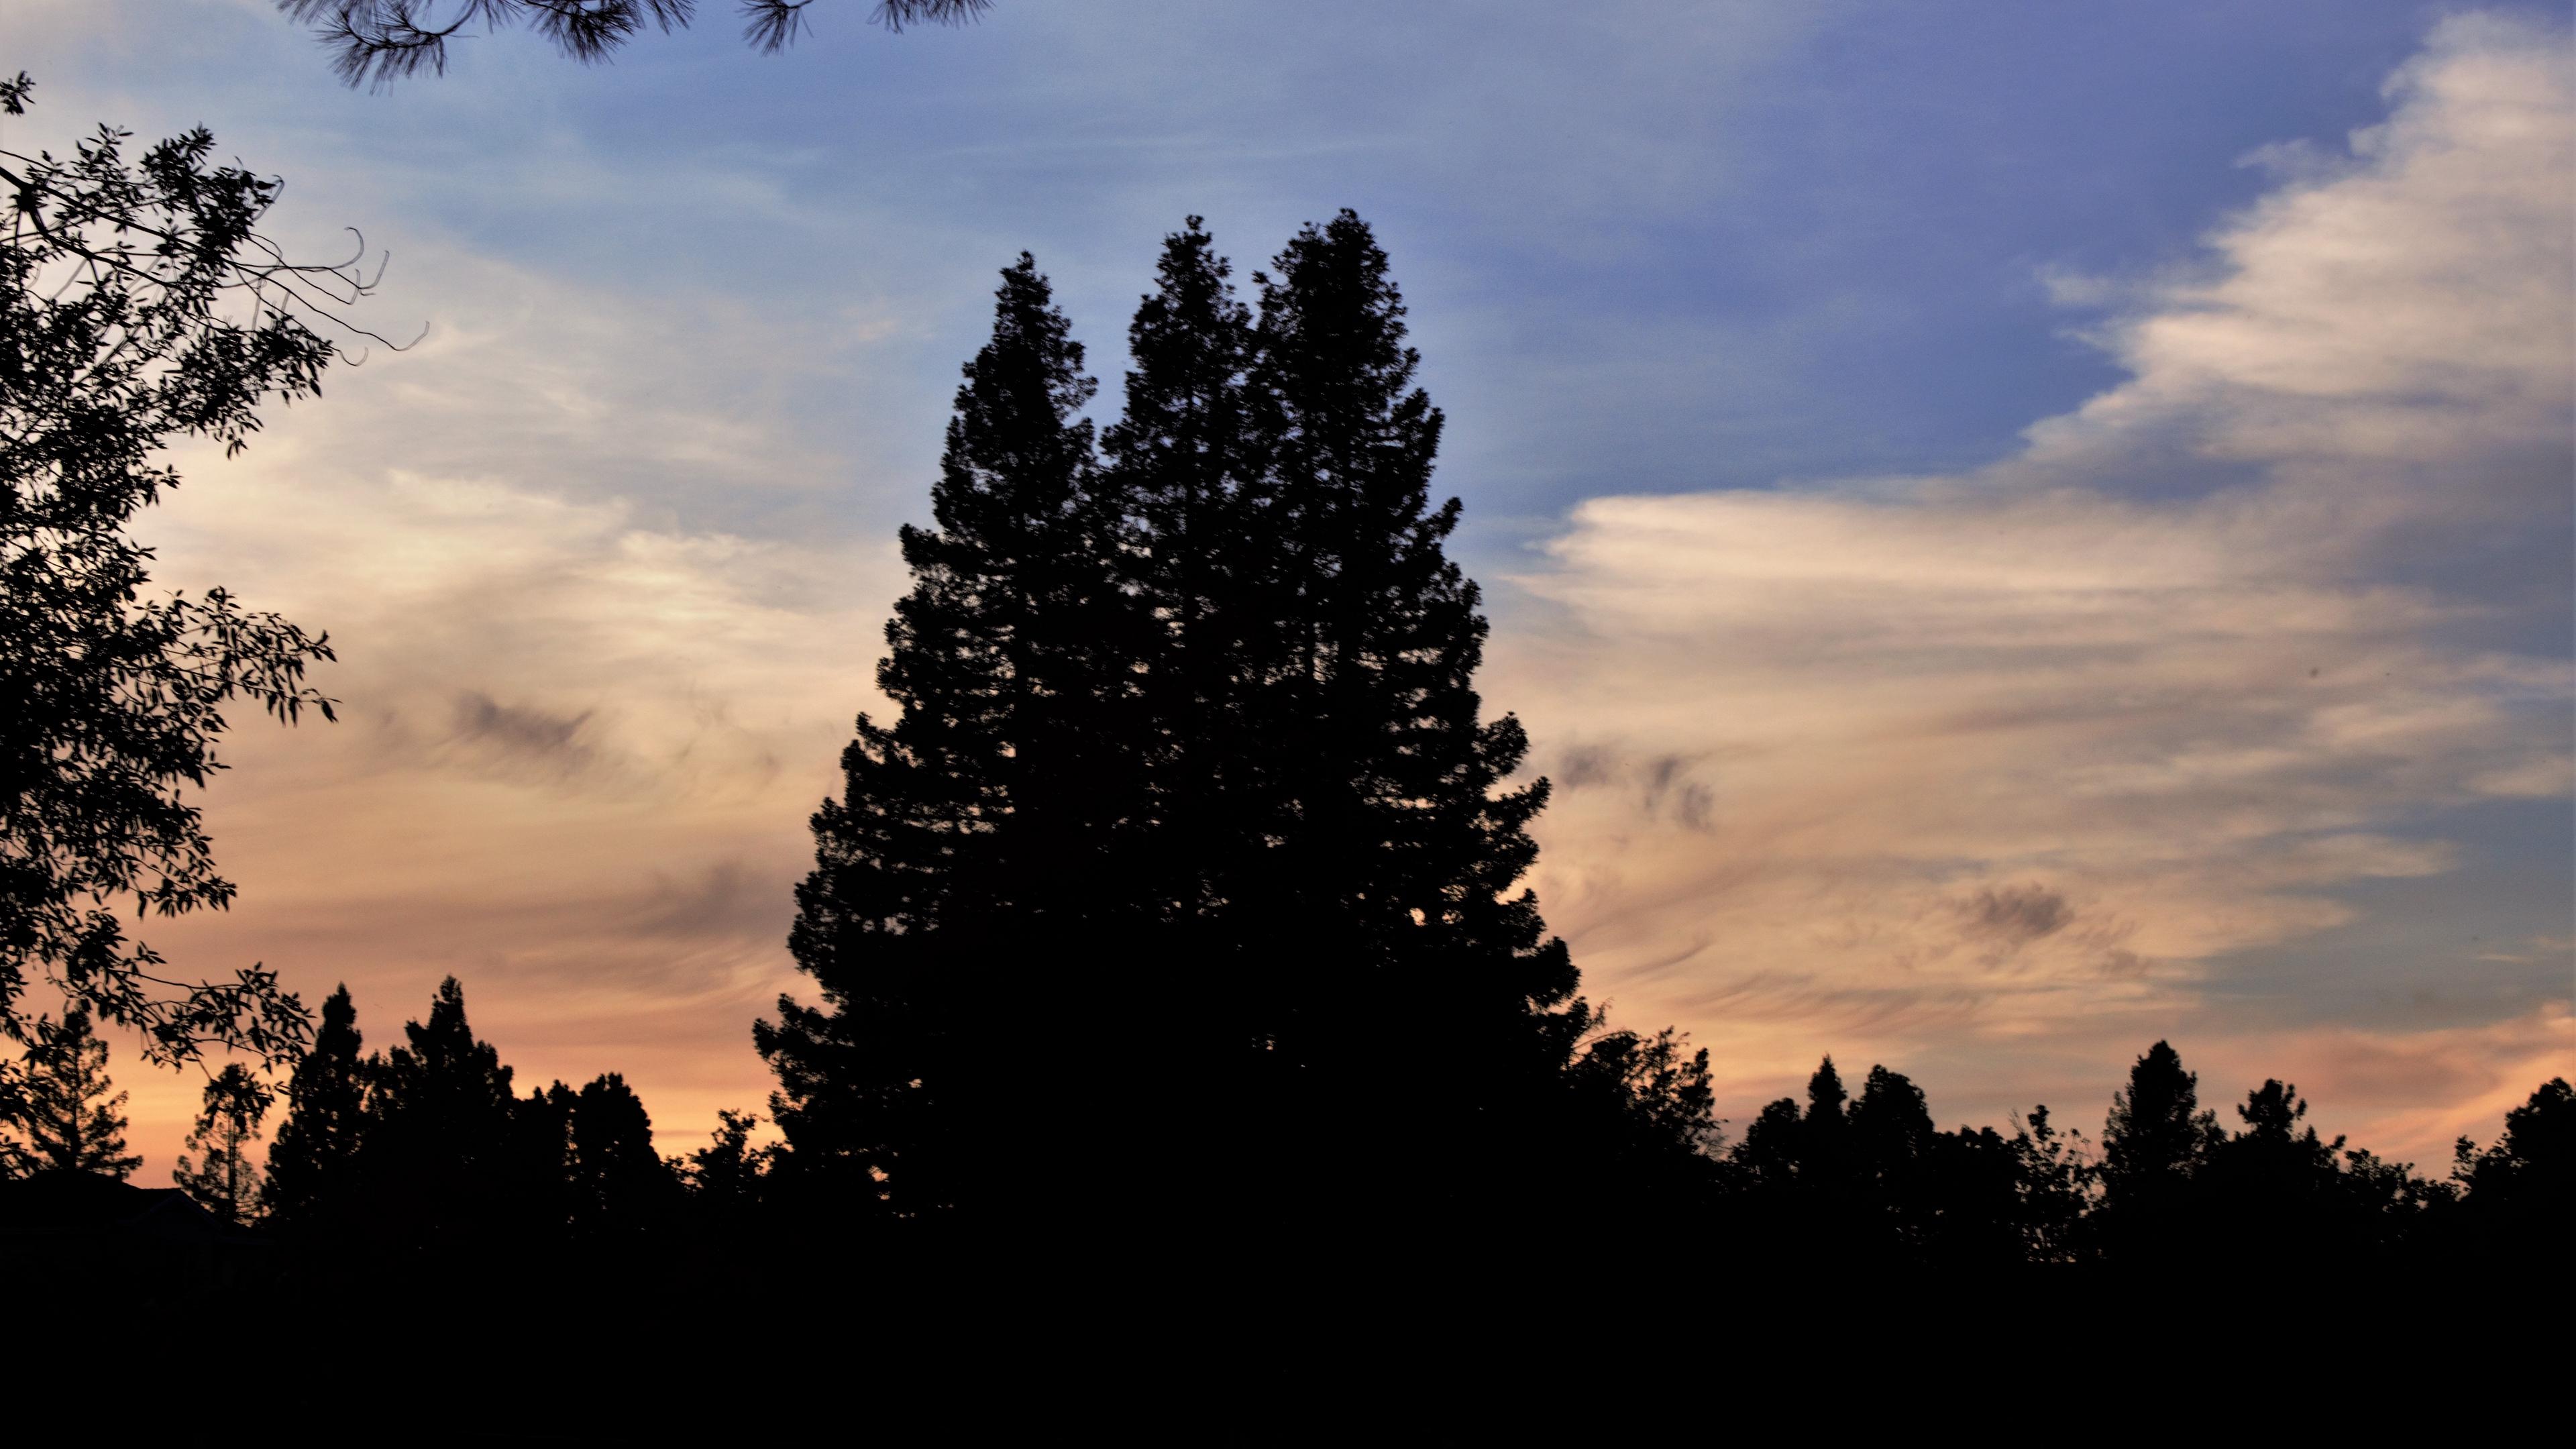 trees dark sky 4k 1540575806 - trees, dark, sky 4k - Trees, Sky, Dark